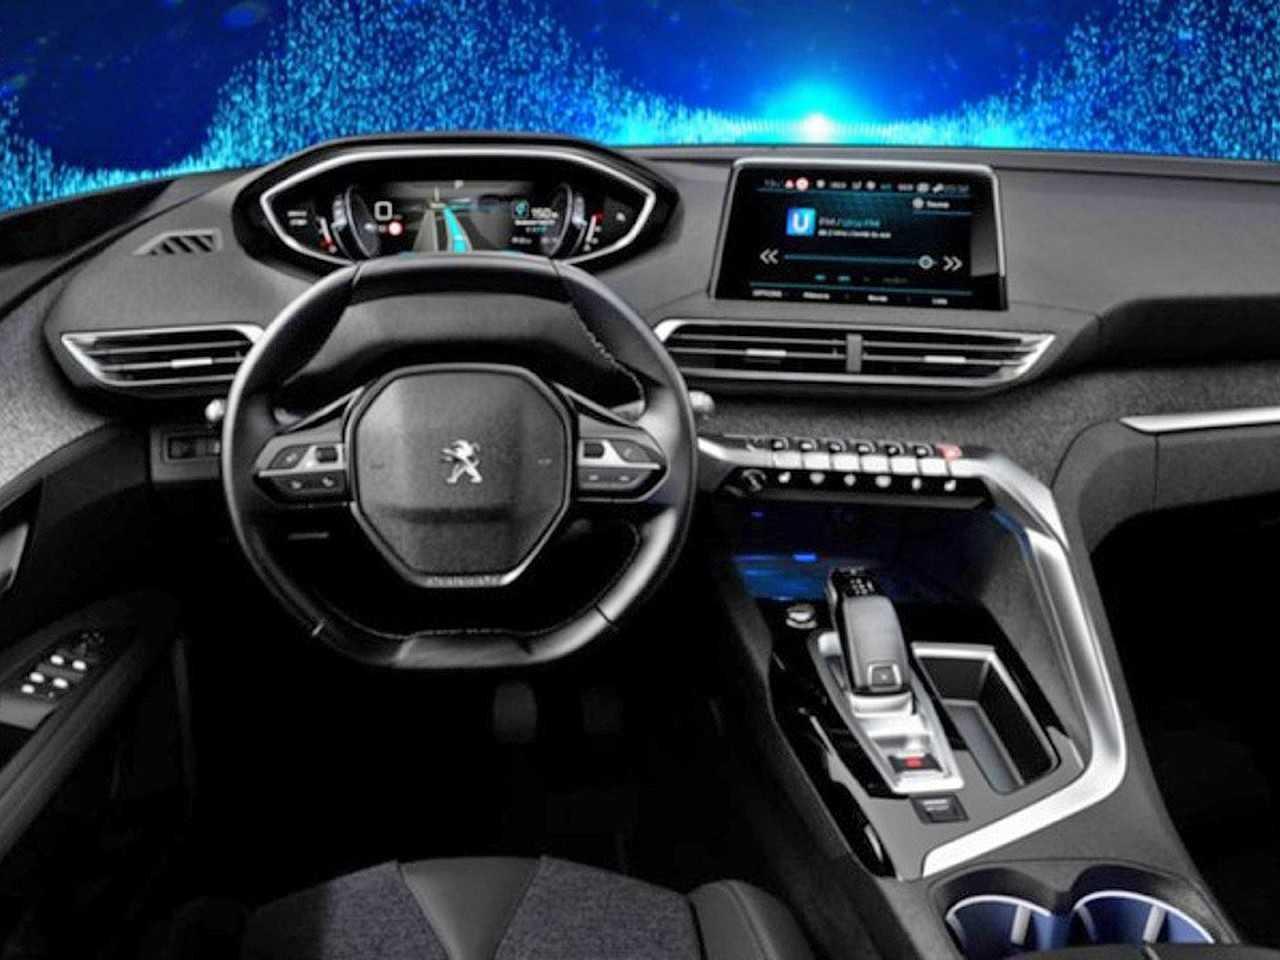 Novo painel do Peugeot 3008 surpreende